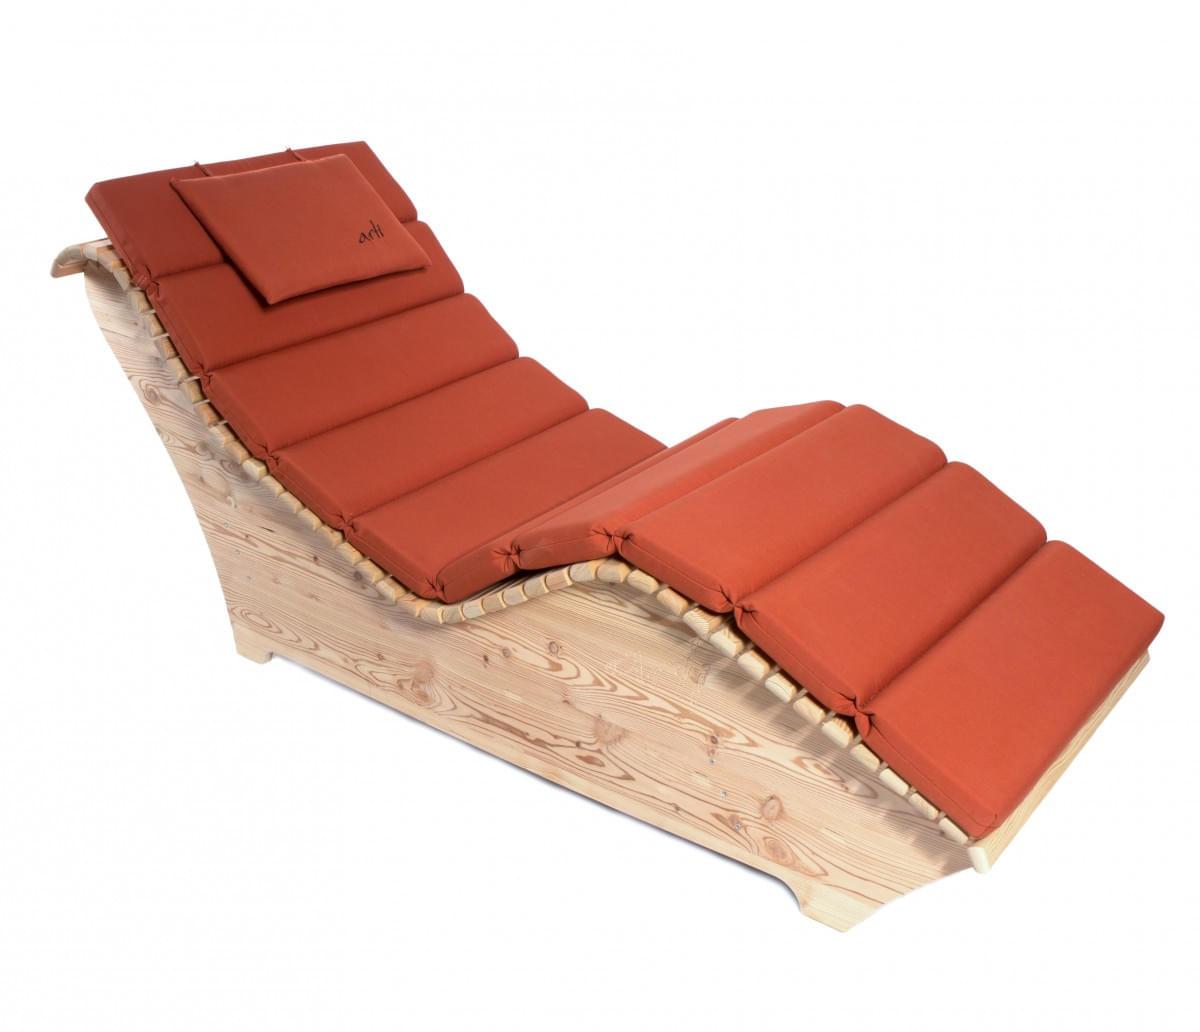 wellnessliegen atelier arti gmbh hopfgarten im brixental. Black Bedroom Furniture Sets. Home Design Ideas